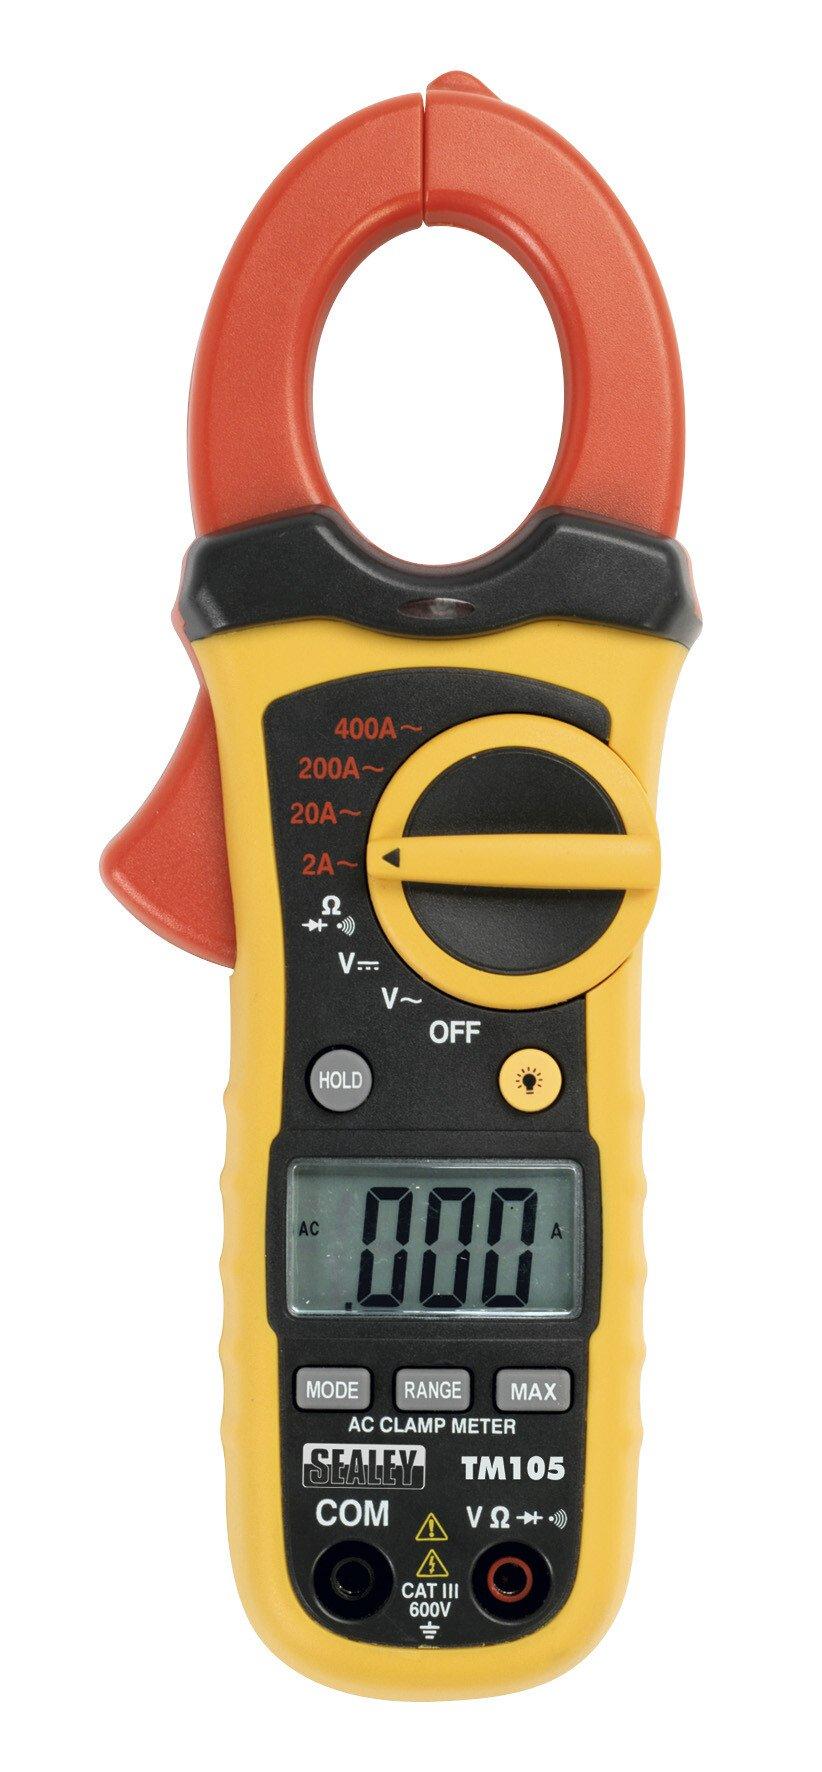 Sealey TM105 Professional Auto Ranging Digital Clamp Meter NCVD - 6 Function